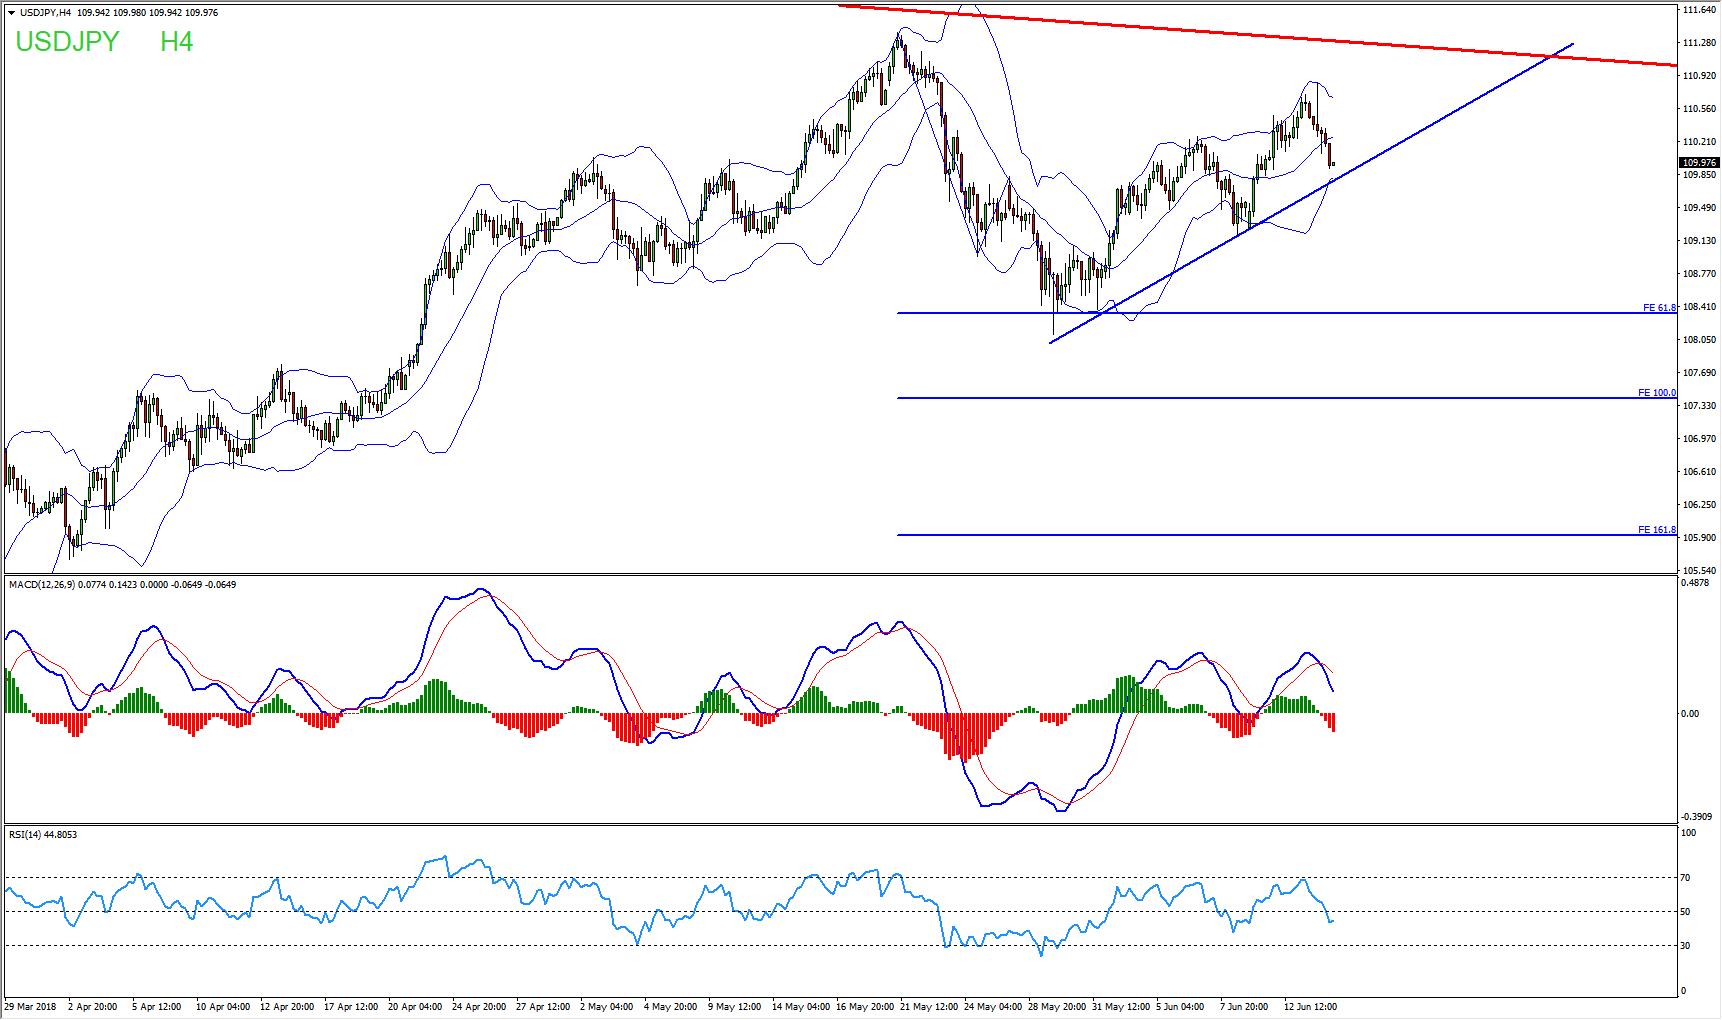 USDJPY Trend Line Break Will Provide Sells